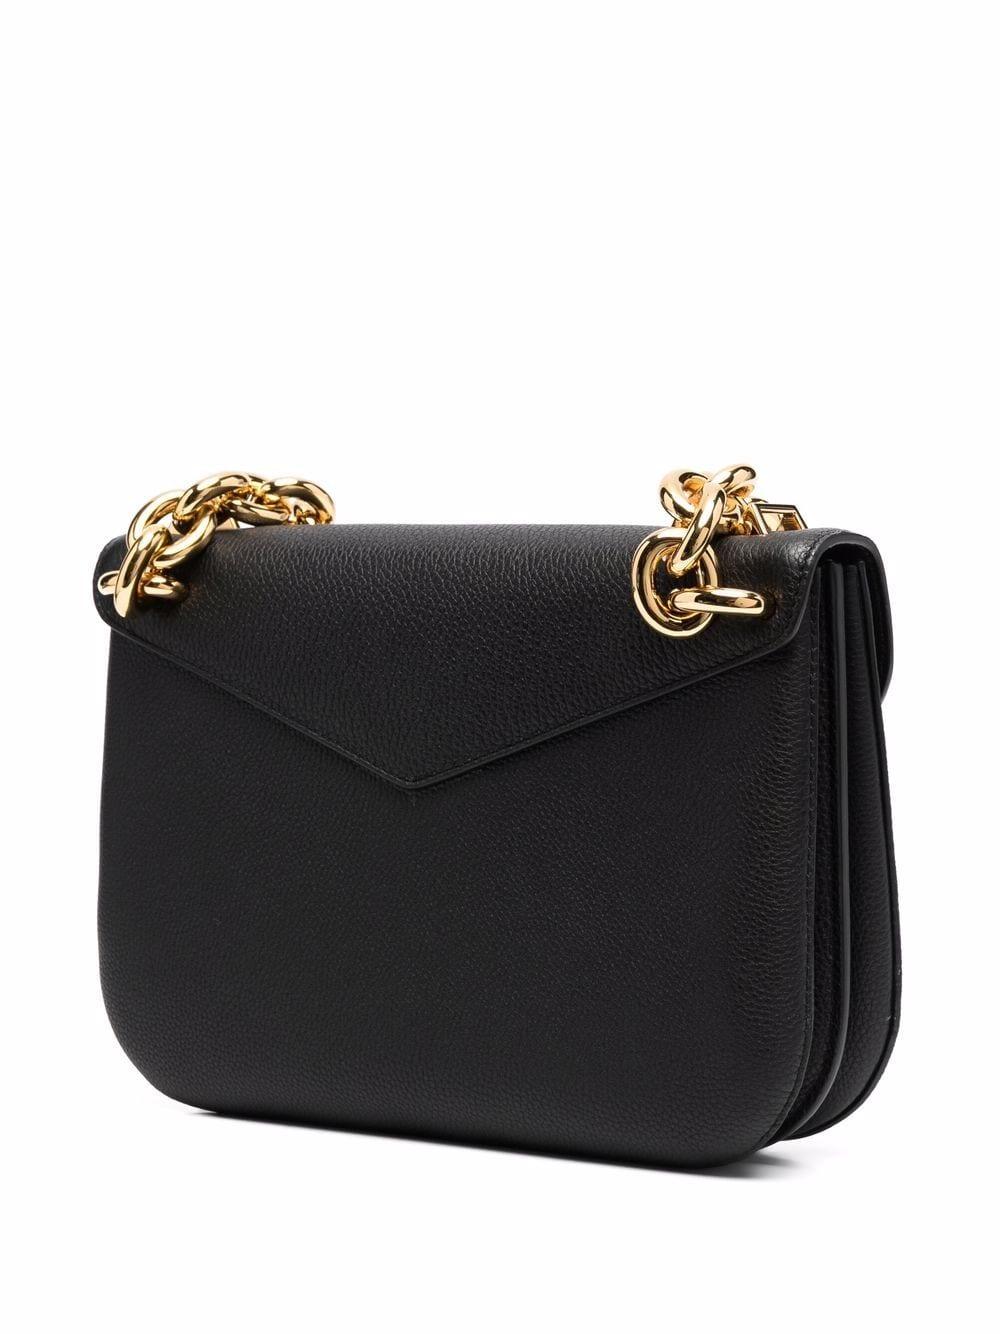 Picture of Bottega Veneta | Mount Envelope Clutch Bag